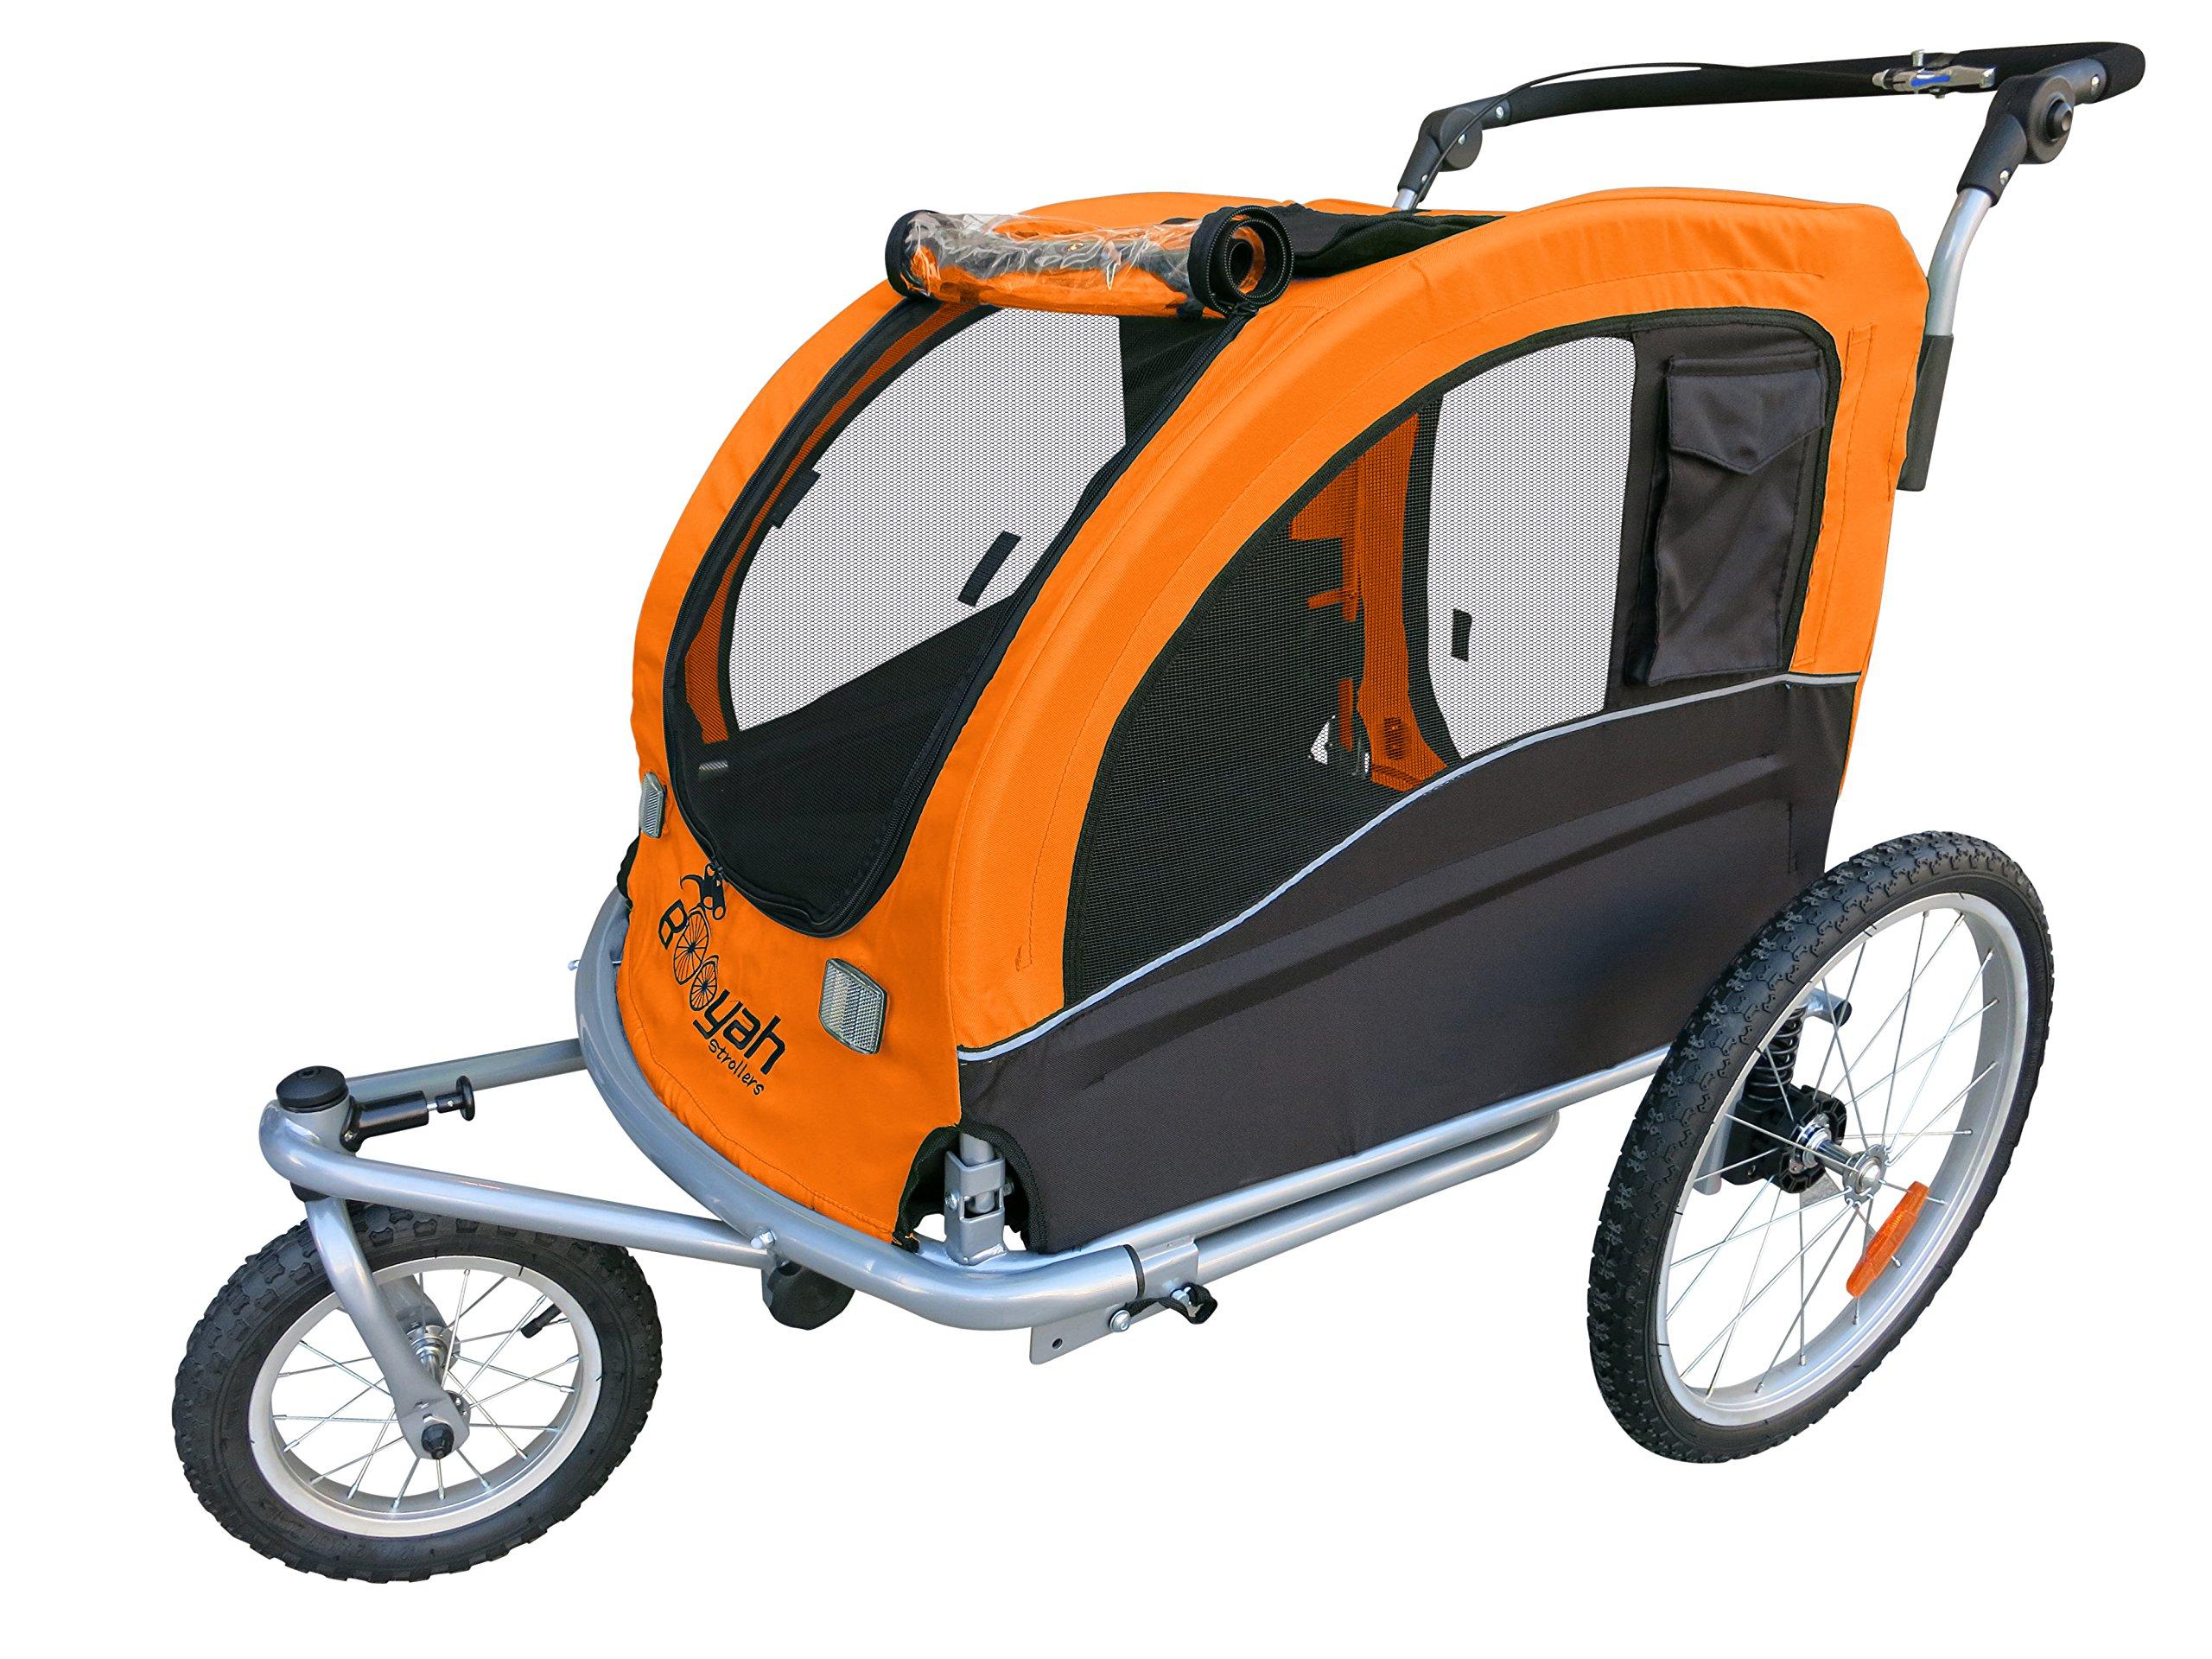 Large Pet Dog Stroller and Bike Bicycle Trailer with Suspension/shocks (Orange)